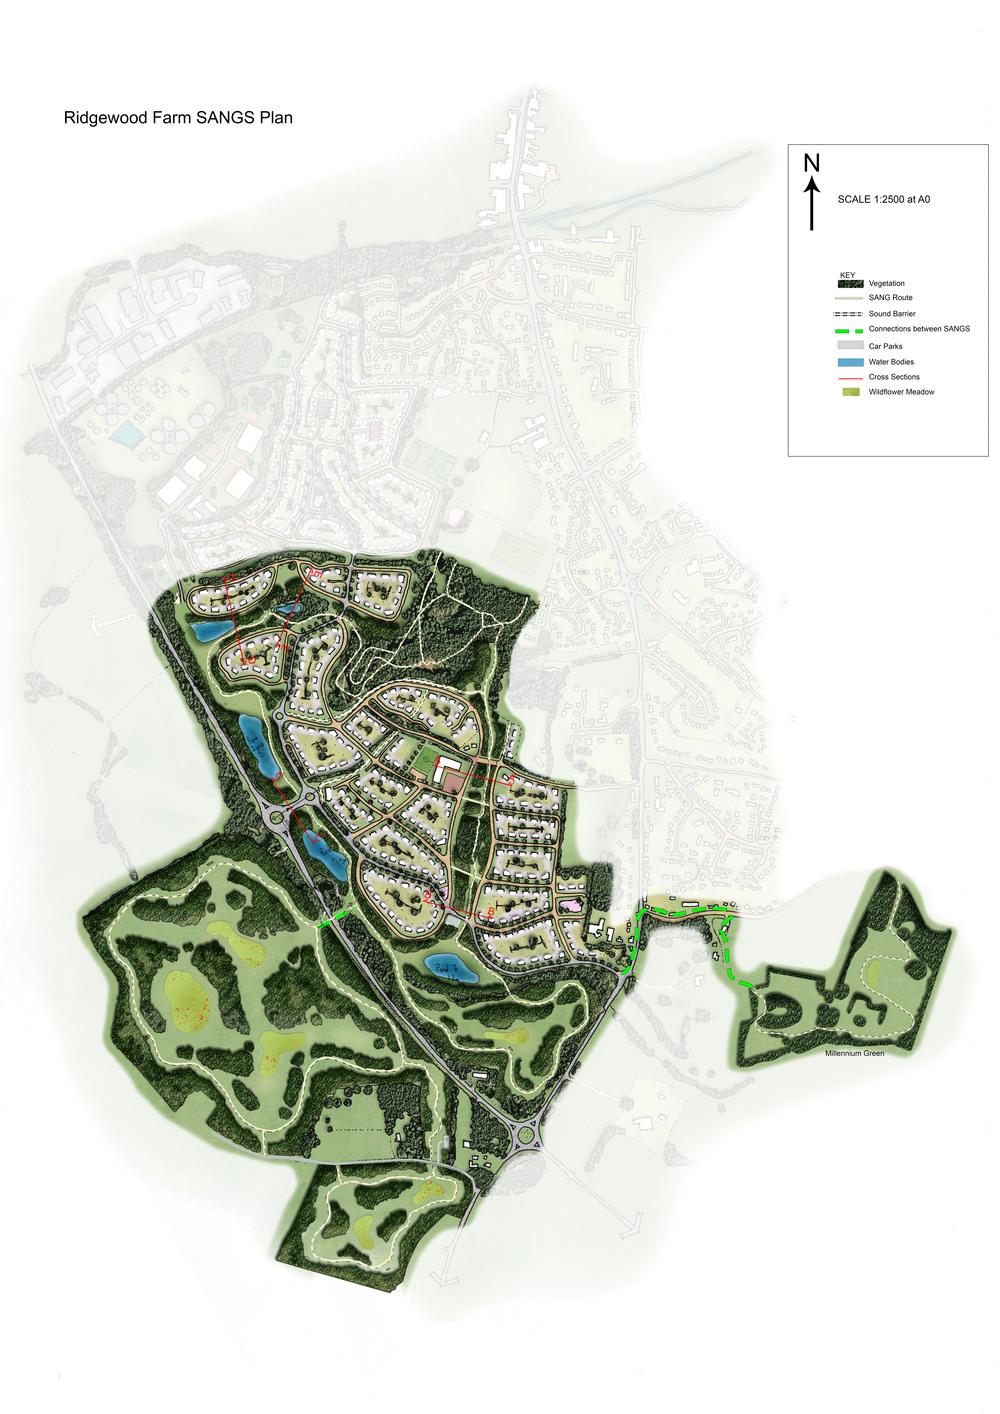 Ridgewood Farm SANGS Overall Plan.jpg